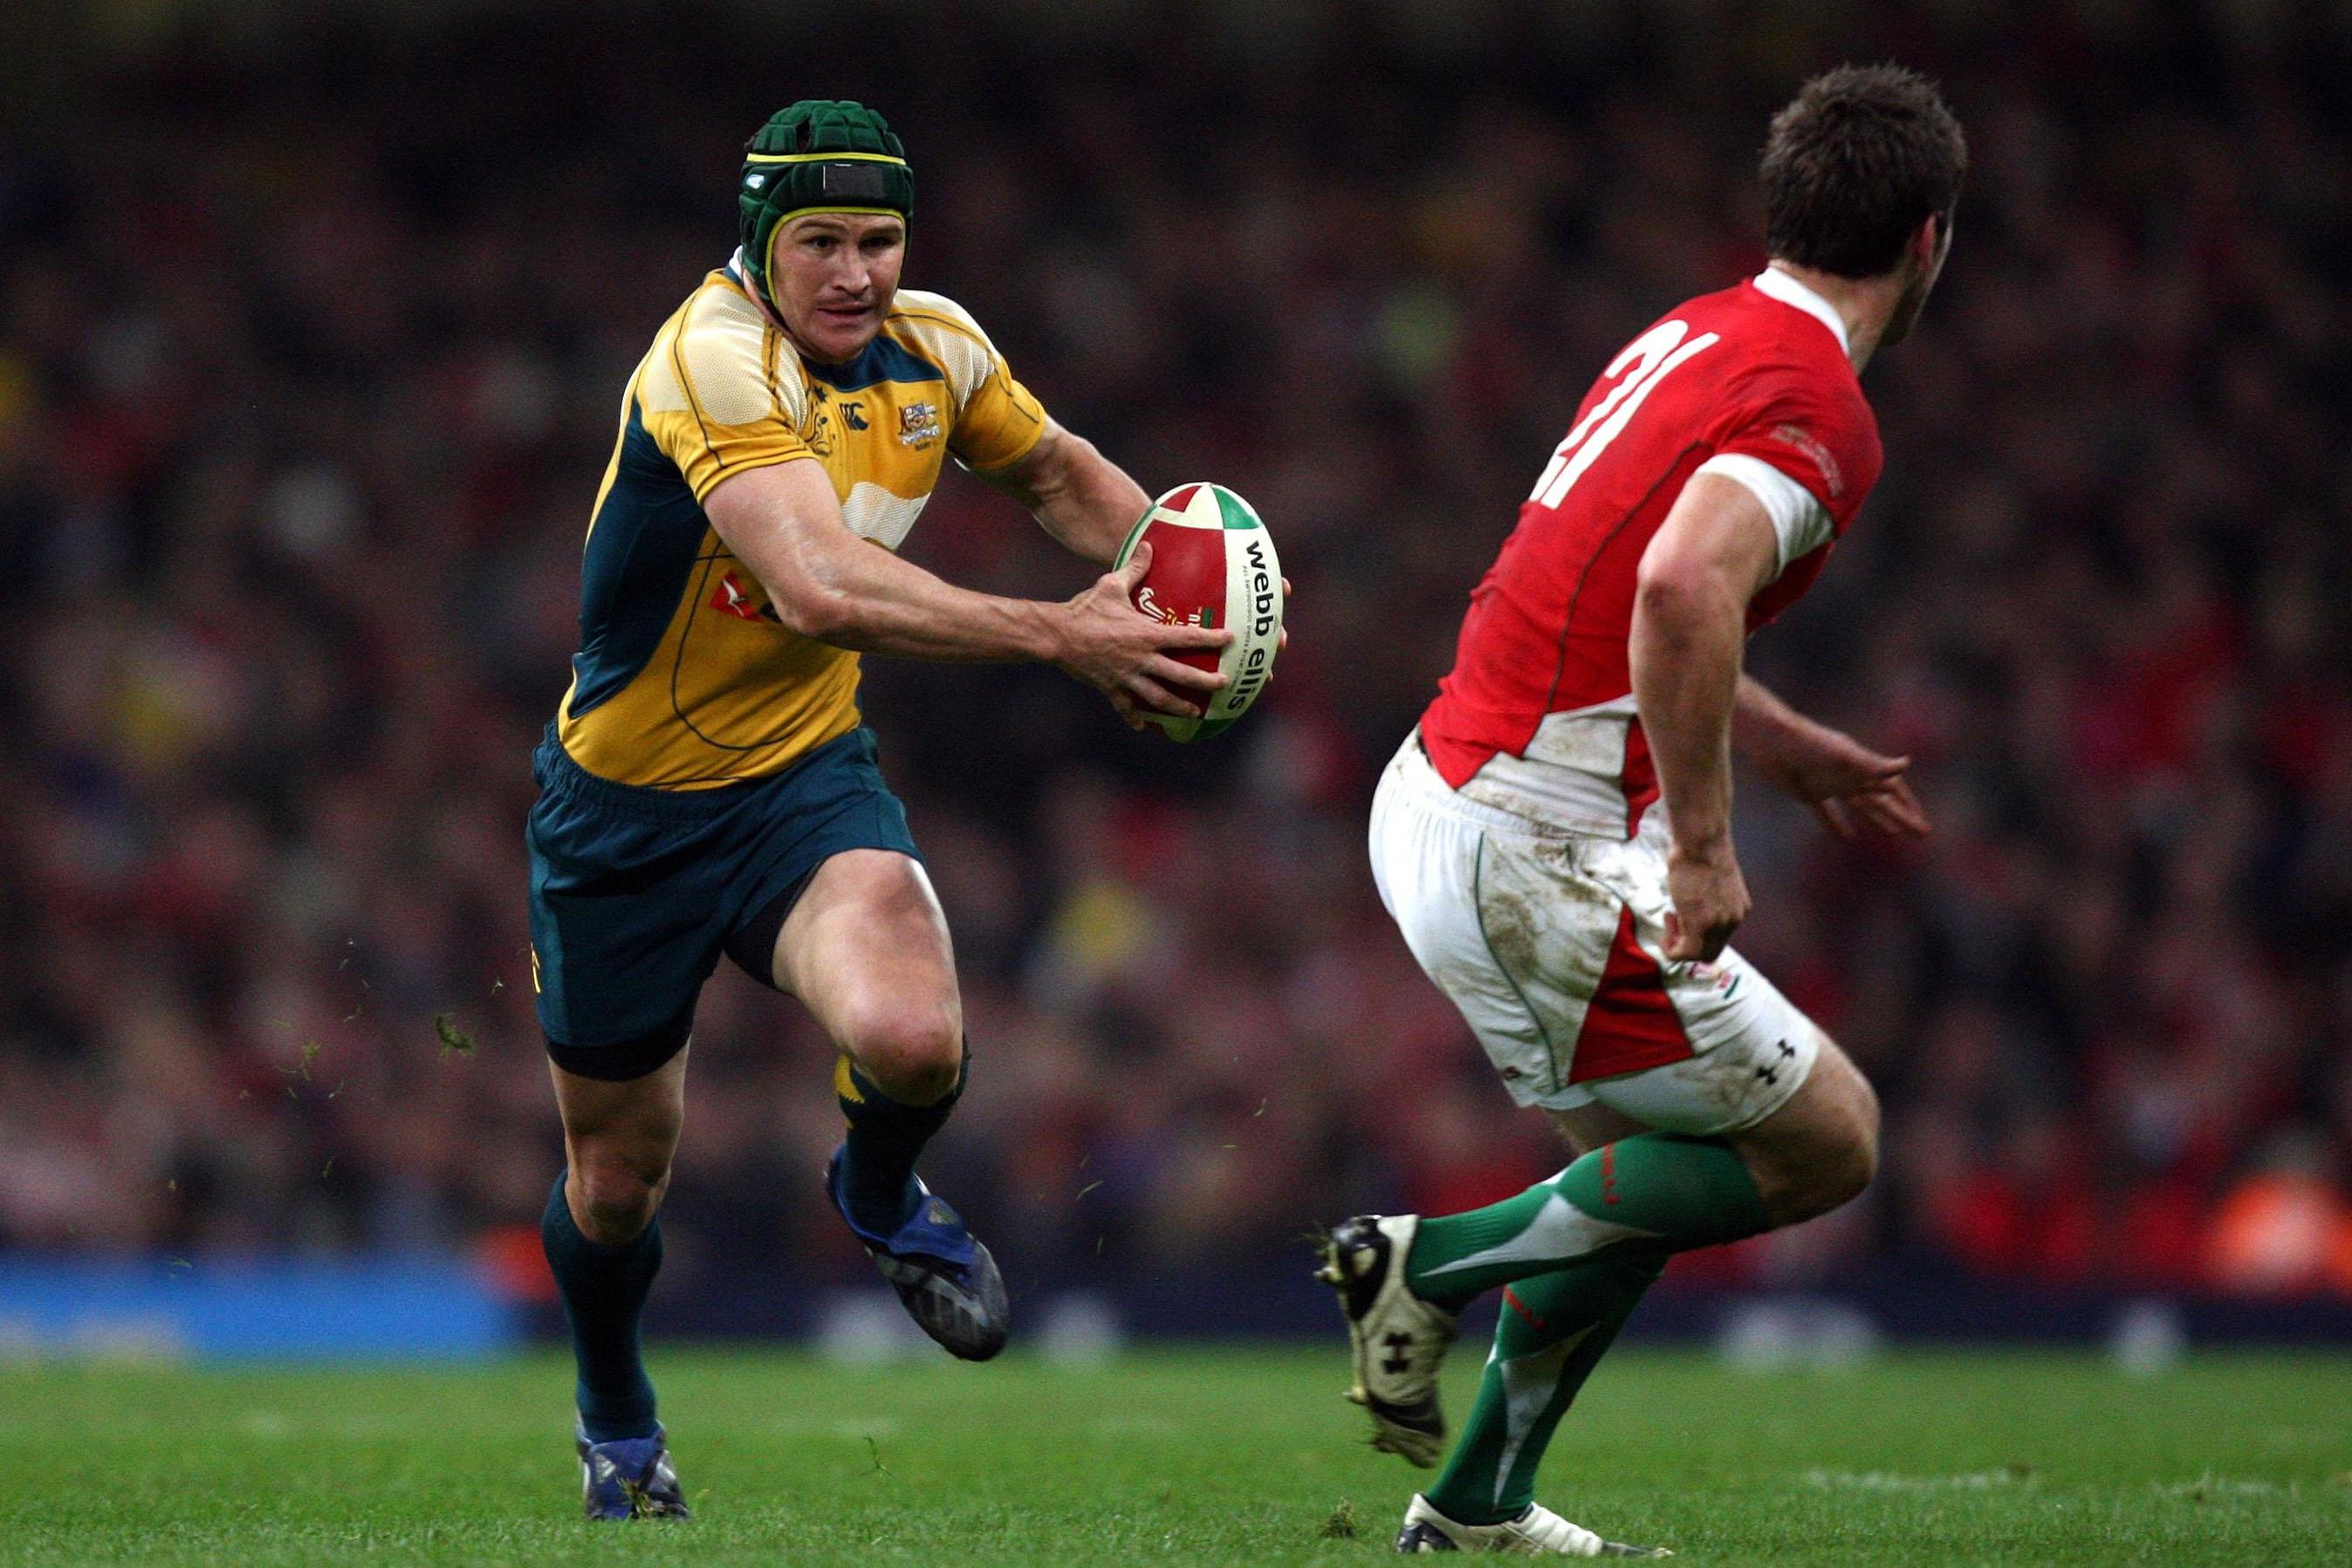 Wales stunned by rampant Australia